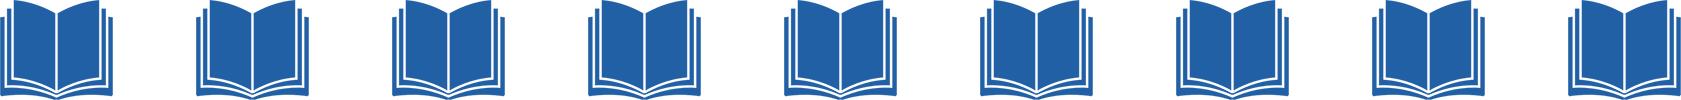 BookBorder.jpg